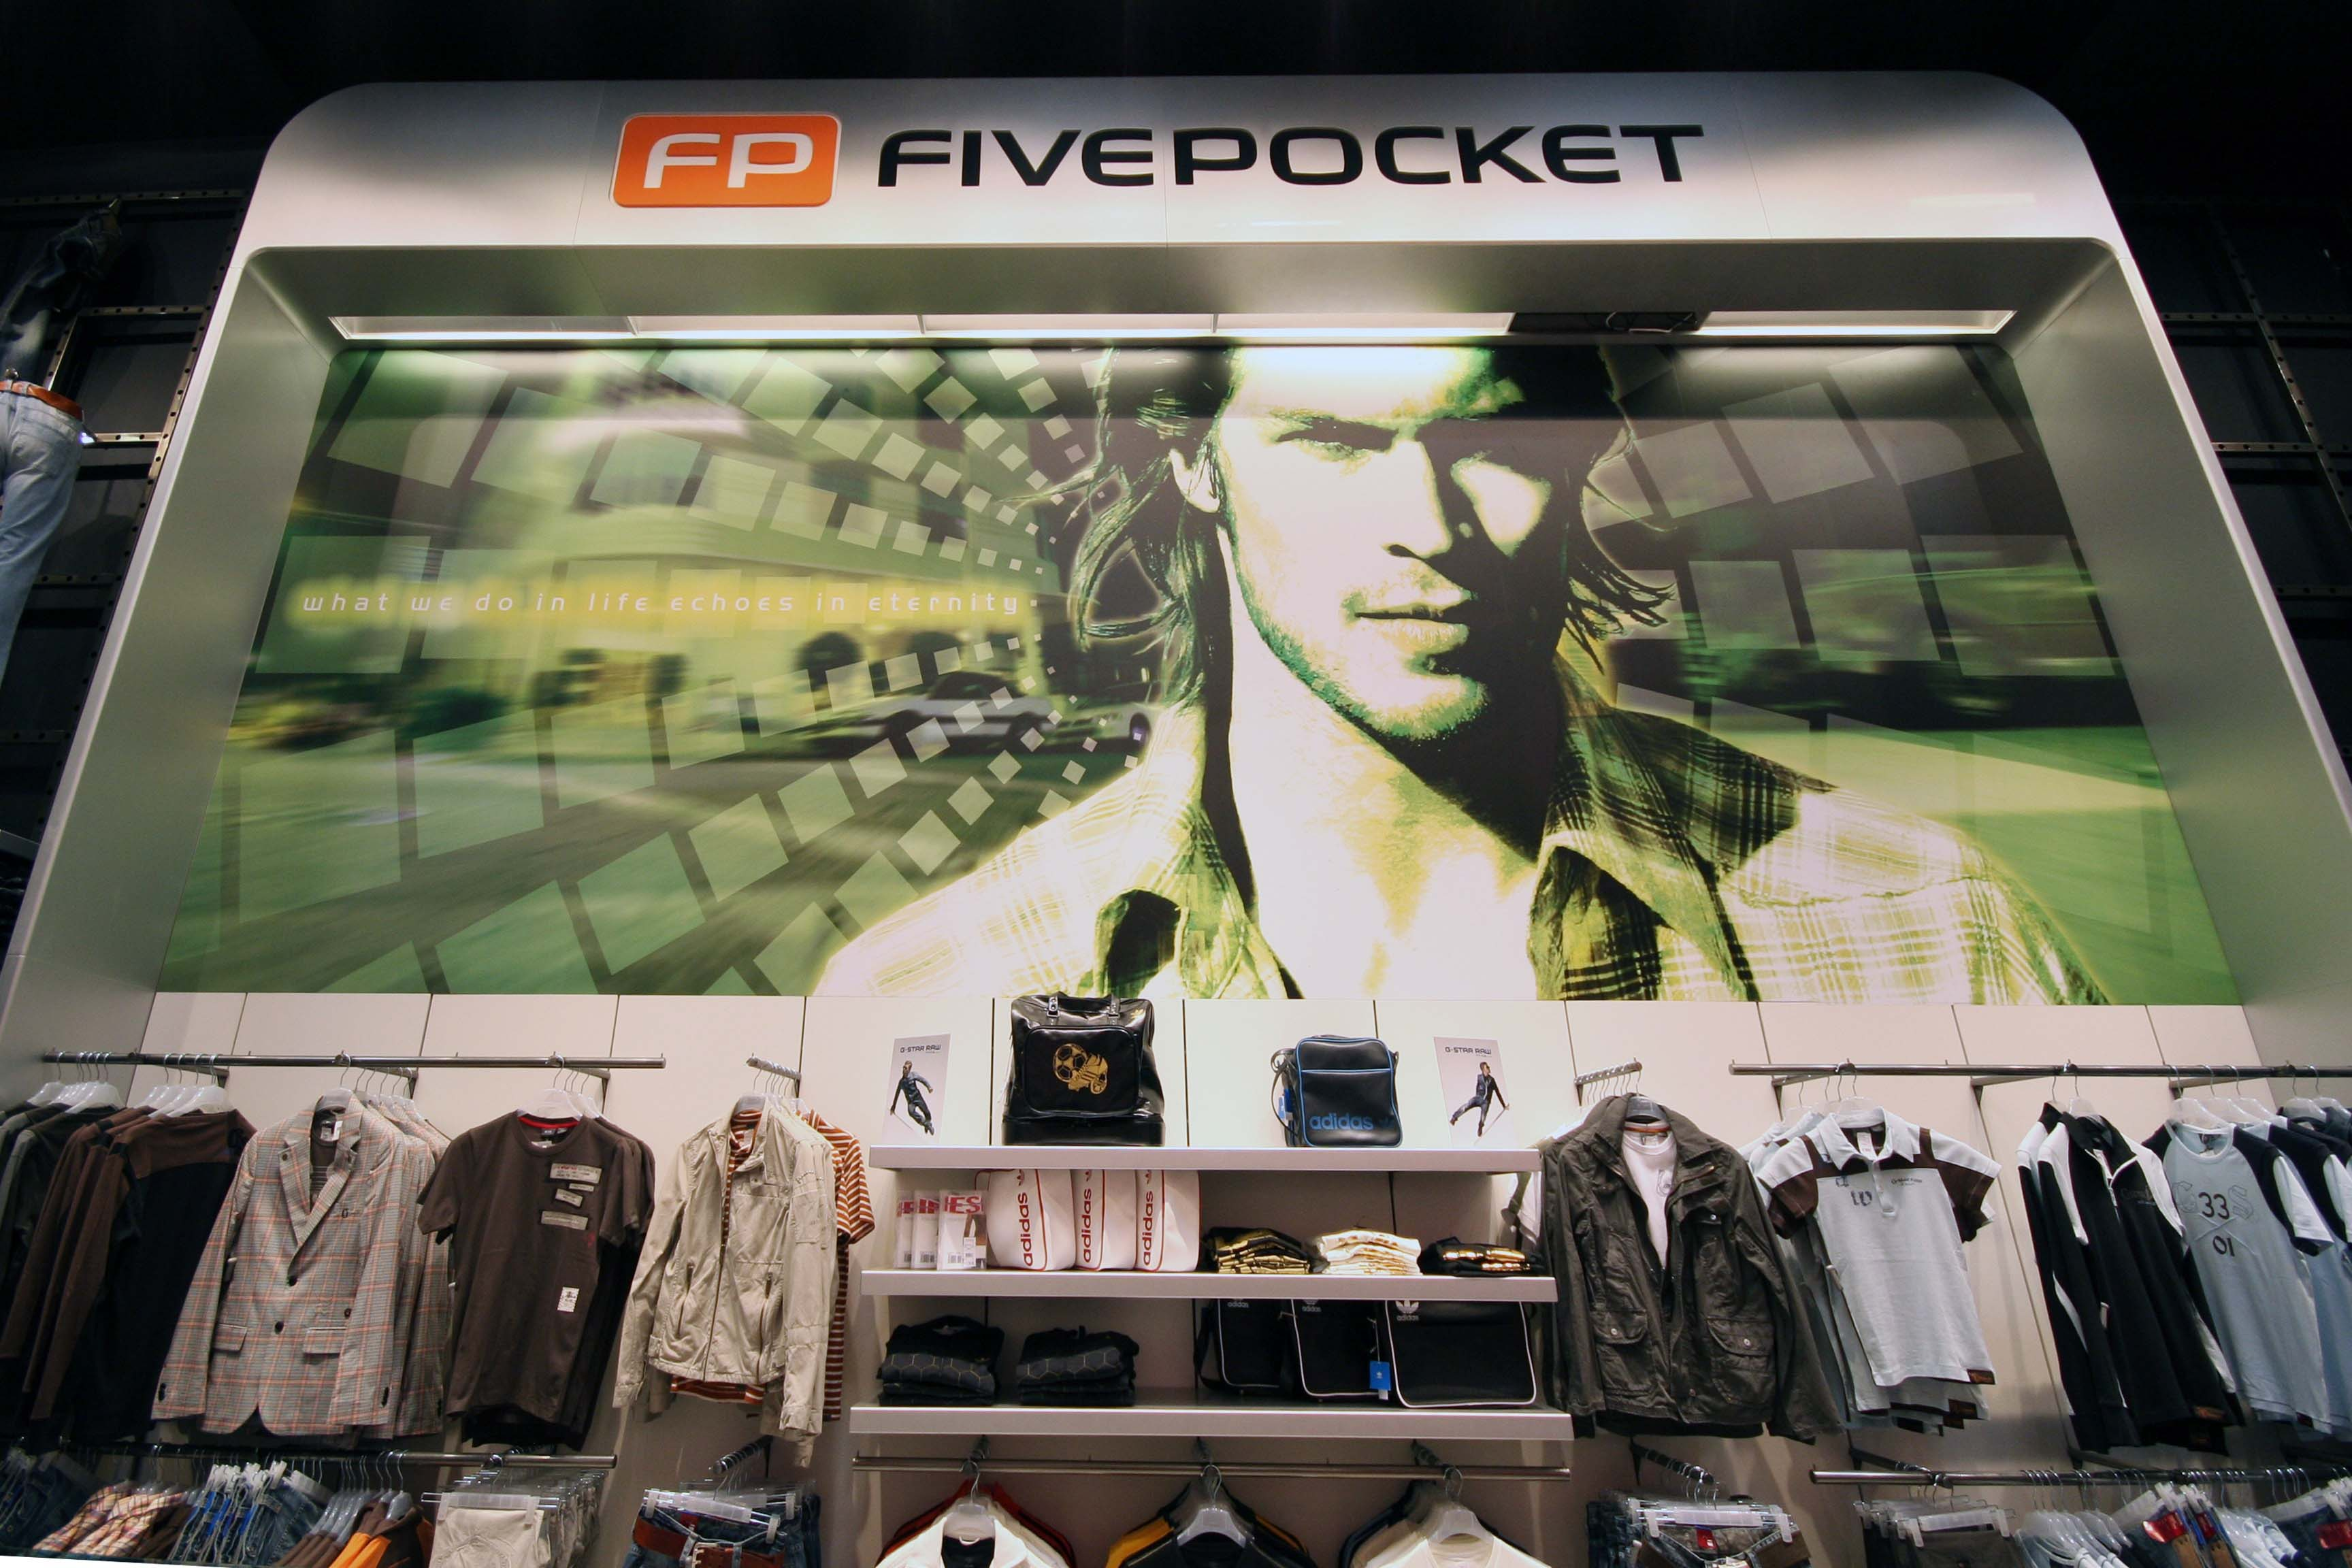 Fivepocket